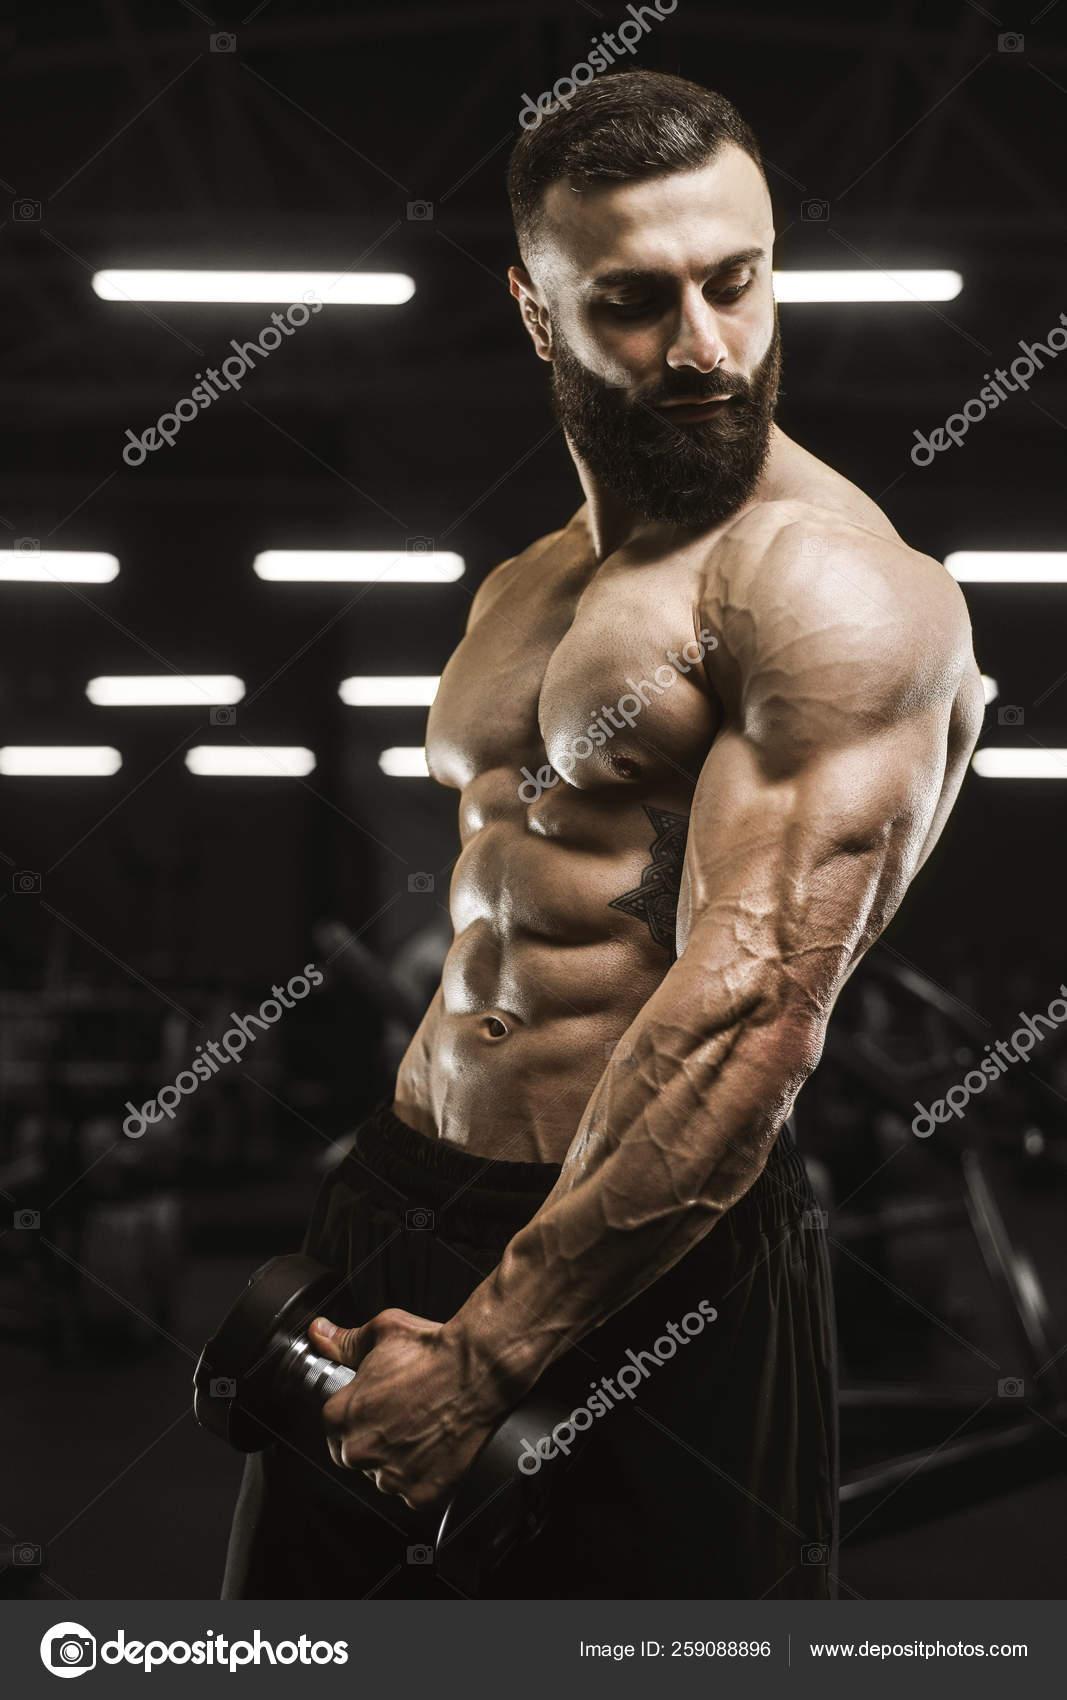 Männer muskulöse nackte Männer